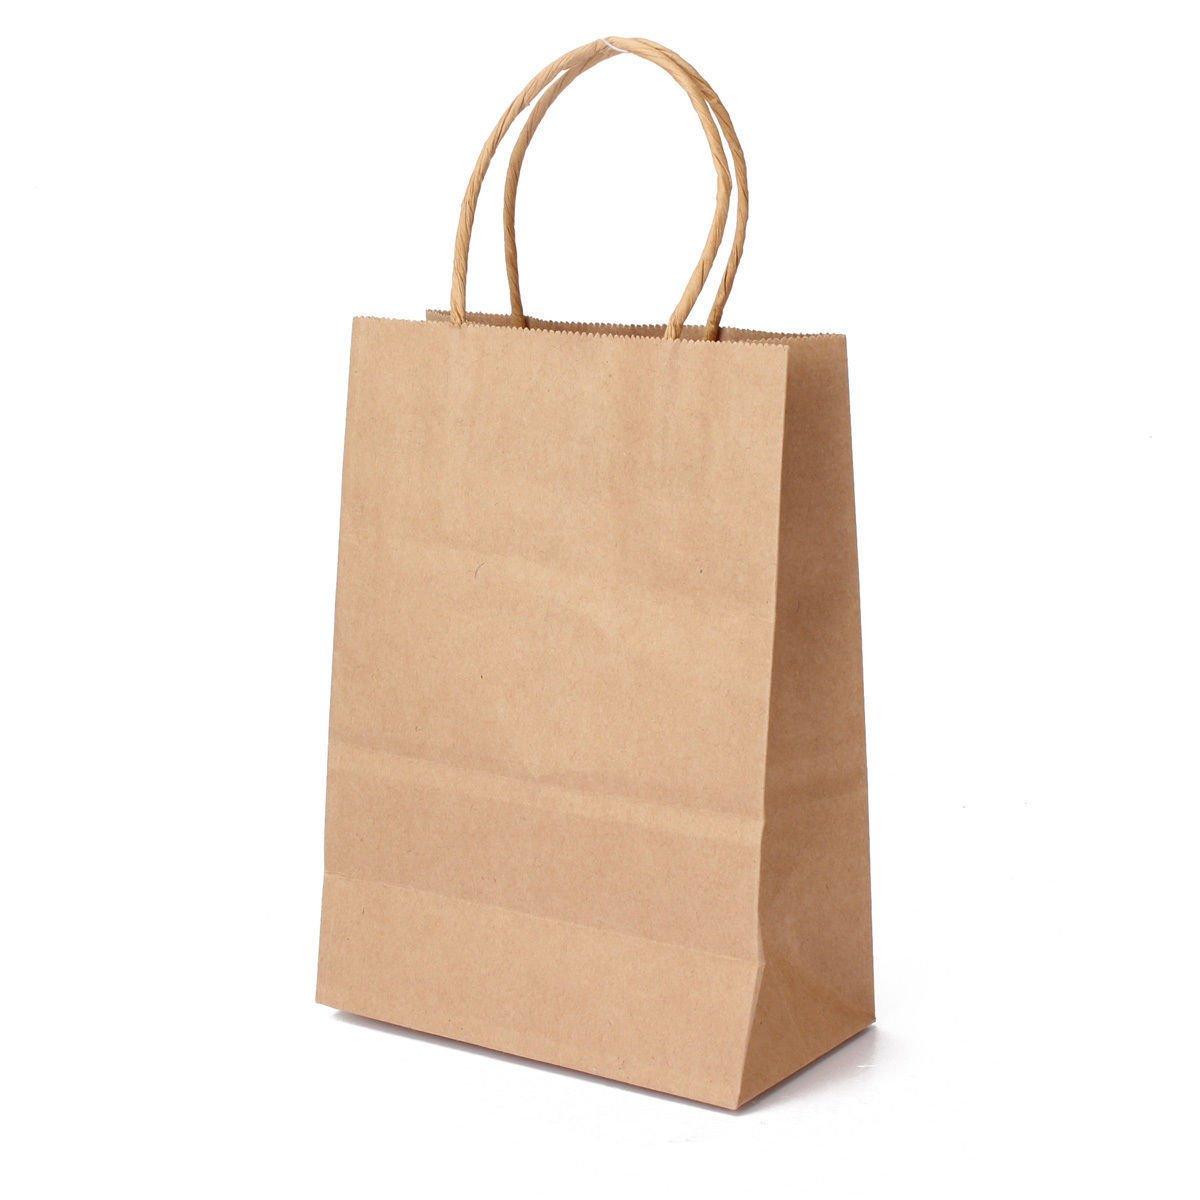 Flexicore Packaging 10''x5''x13'' - 50 Pcs Brown Kraft Paper Bags. 95% POST CONSUMER MATERIALS & FSC CERTIFIED